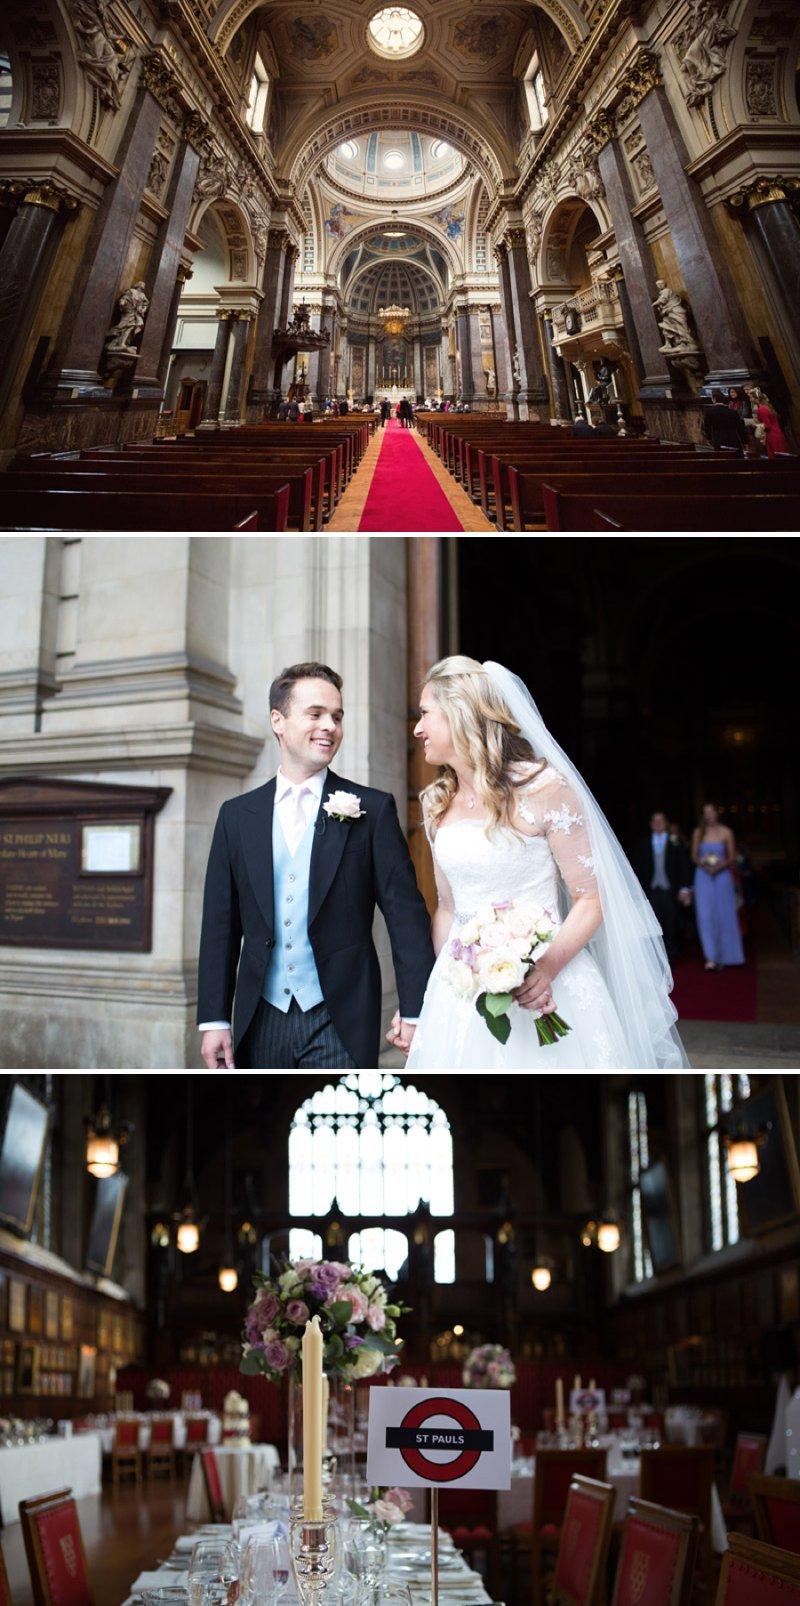 Cary london wedding